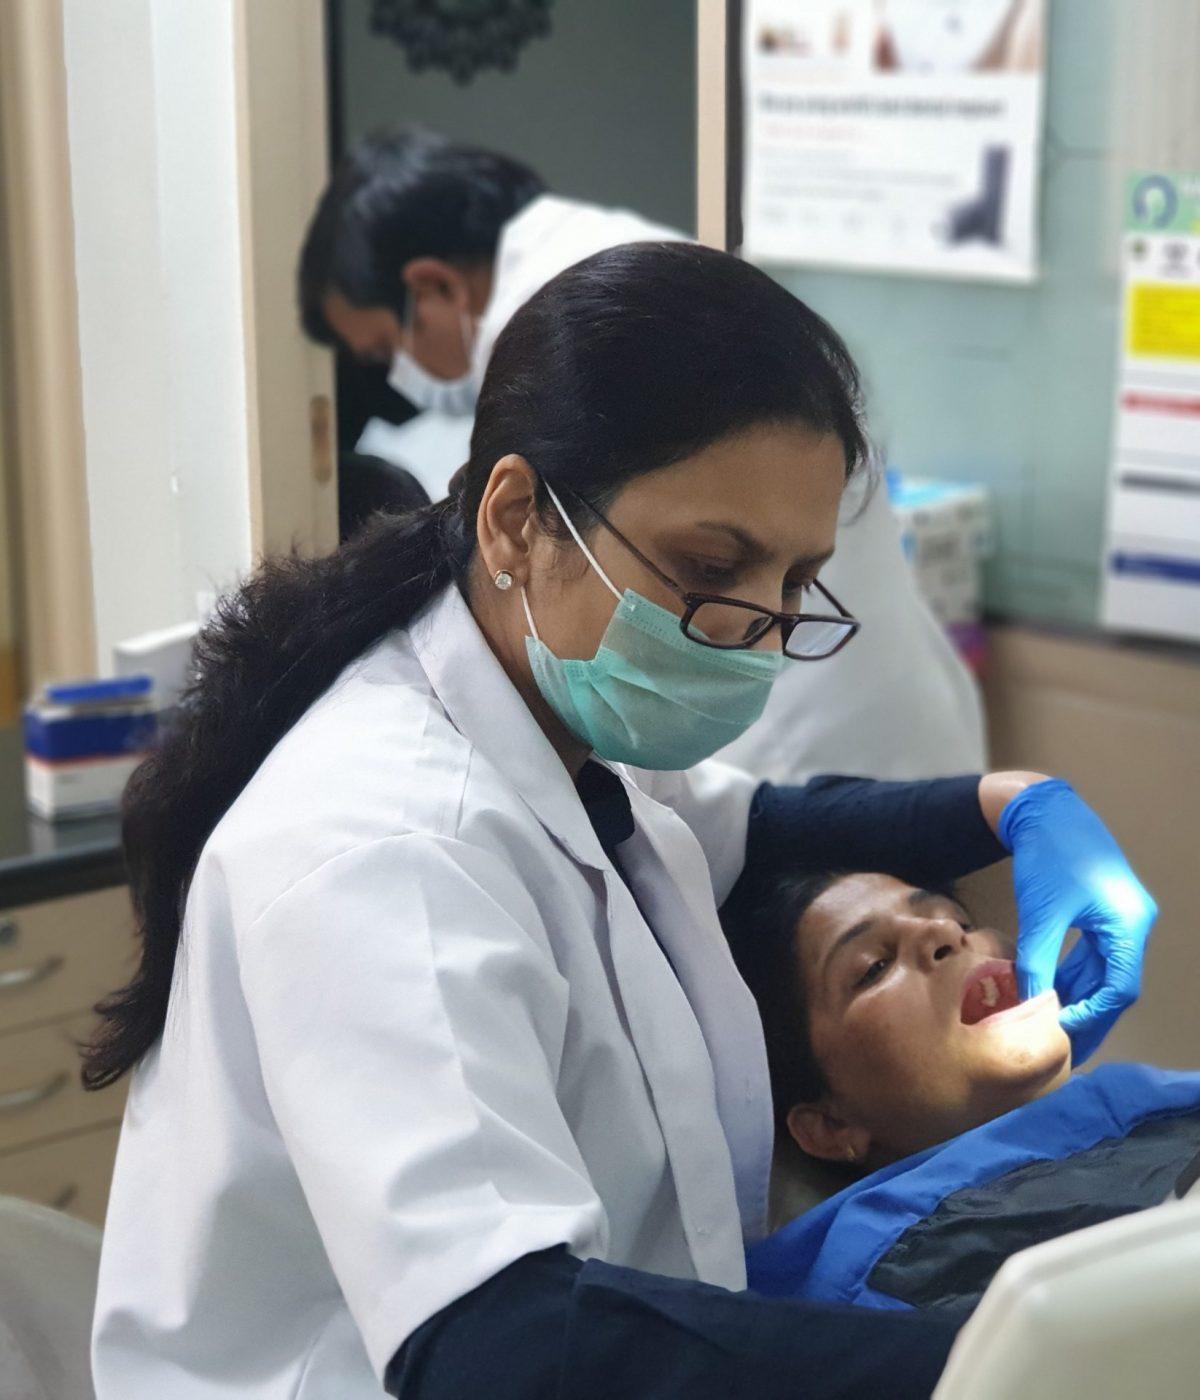 dental treatment by Dr. Rukman